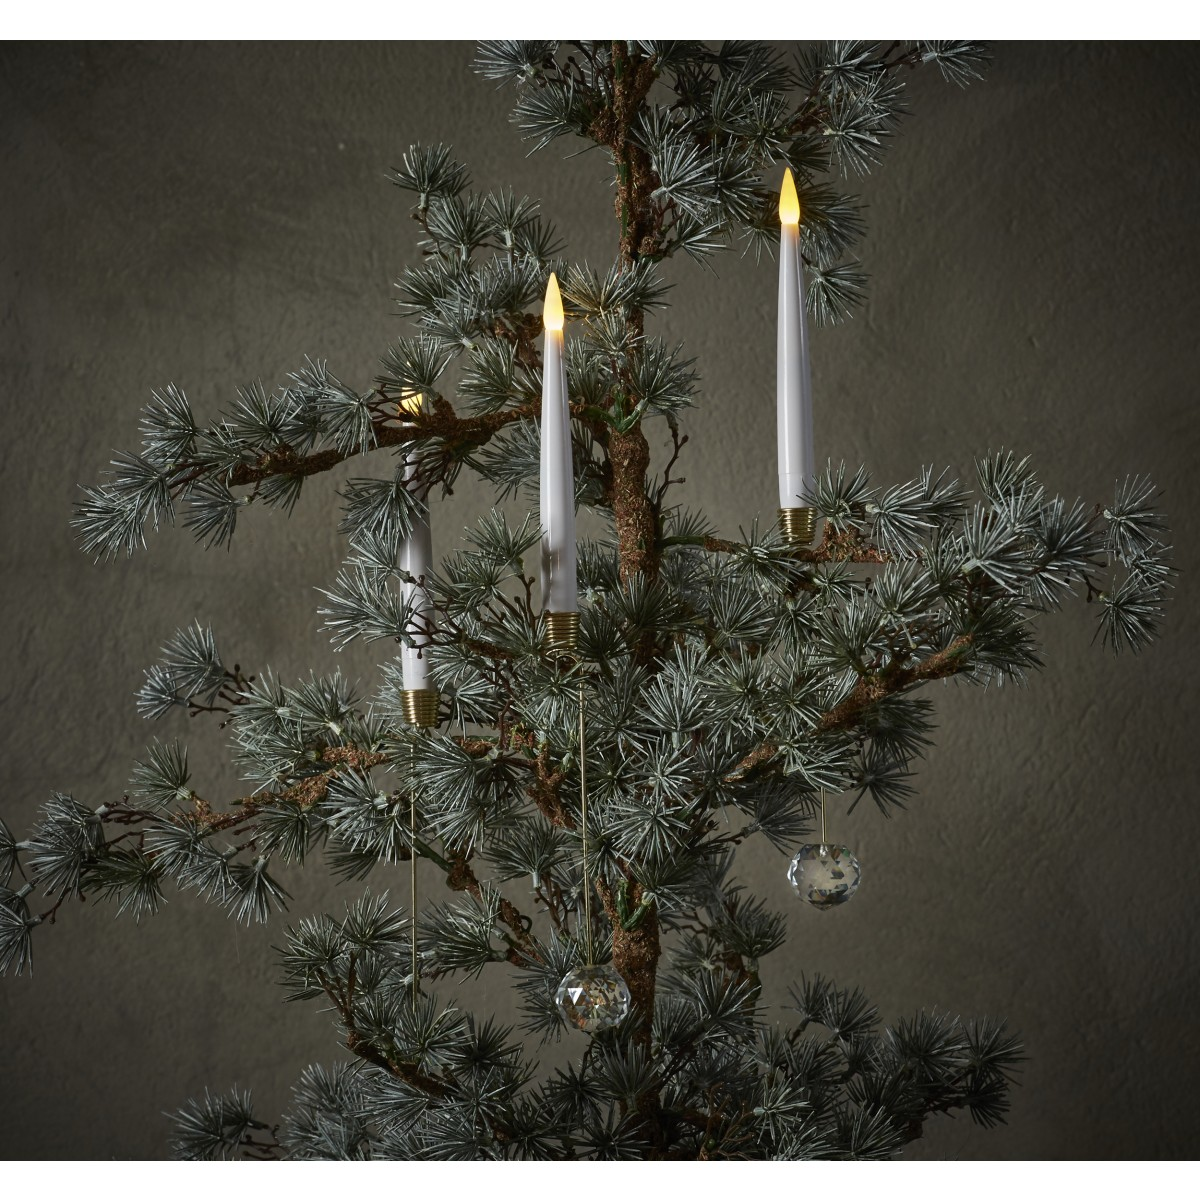 DA´CORE Juletræslys trådløs m/lysholdere 10 stk